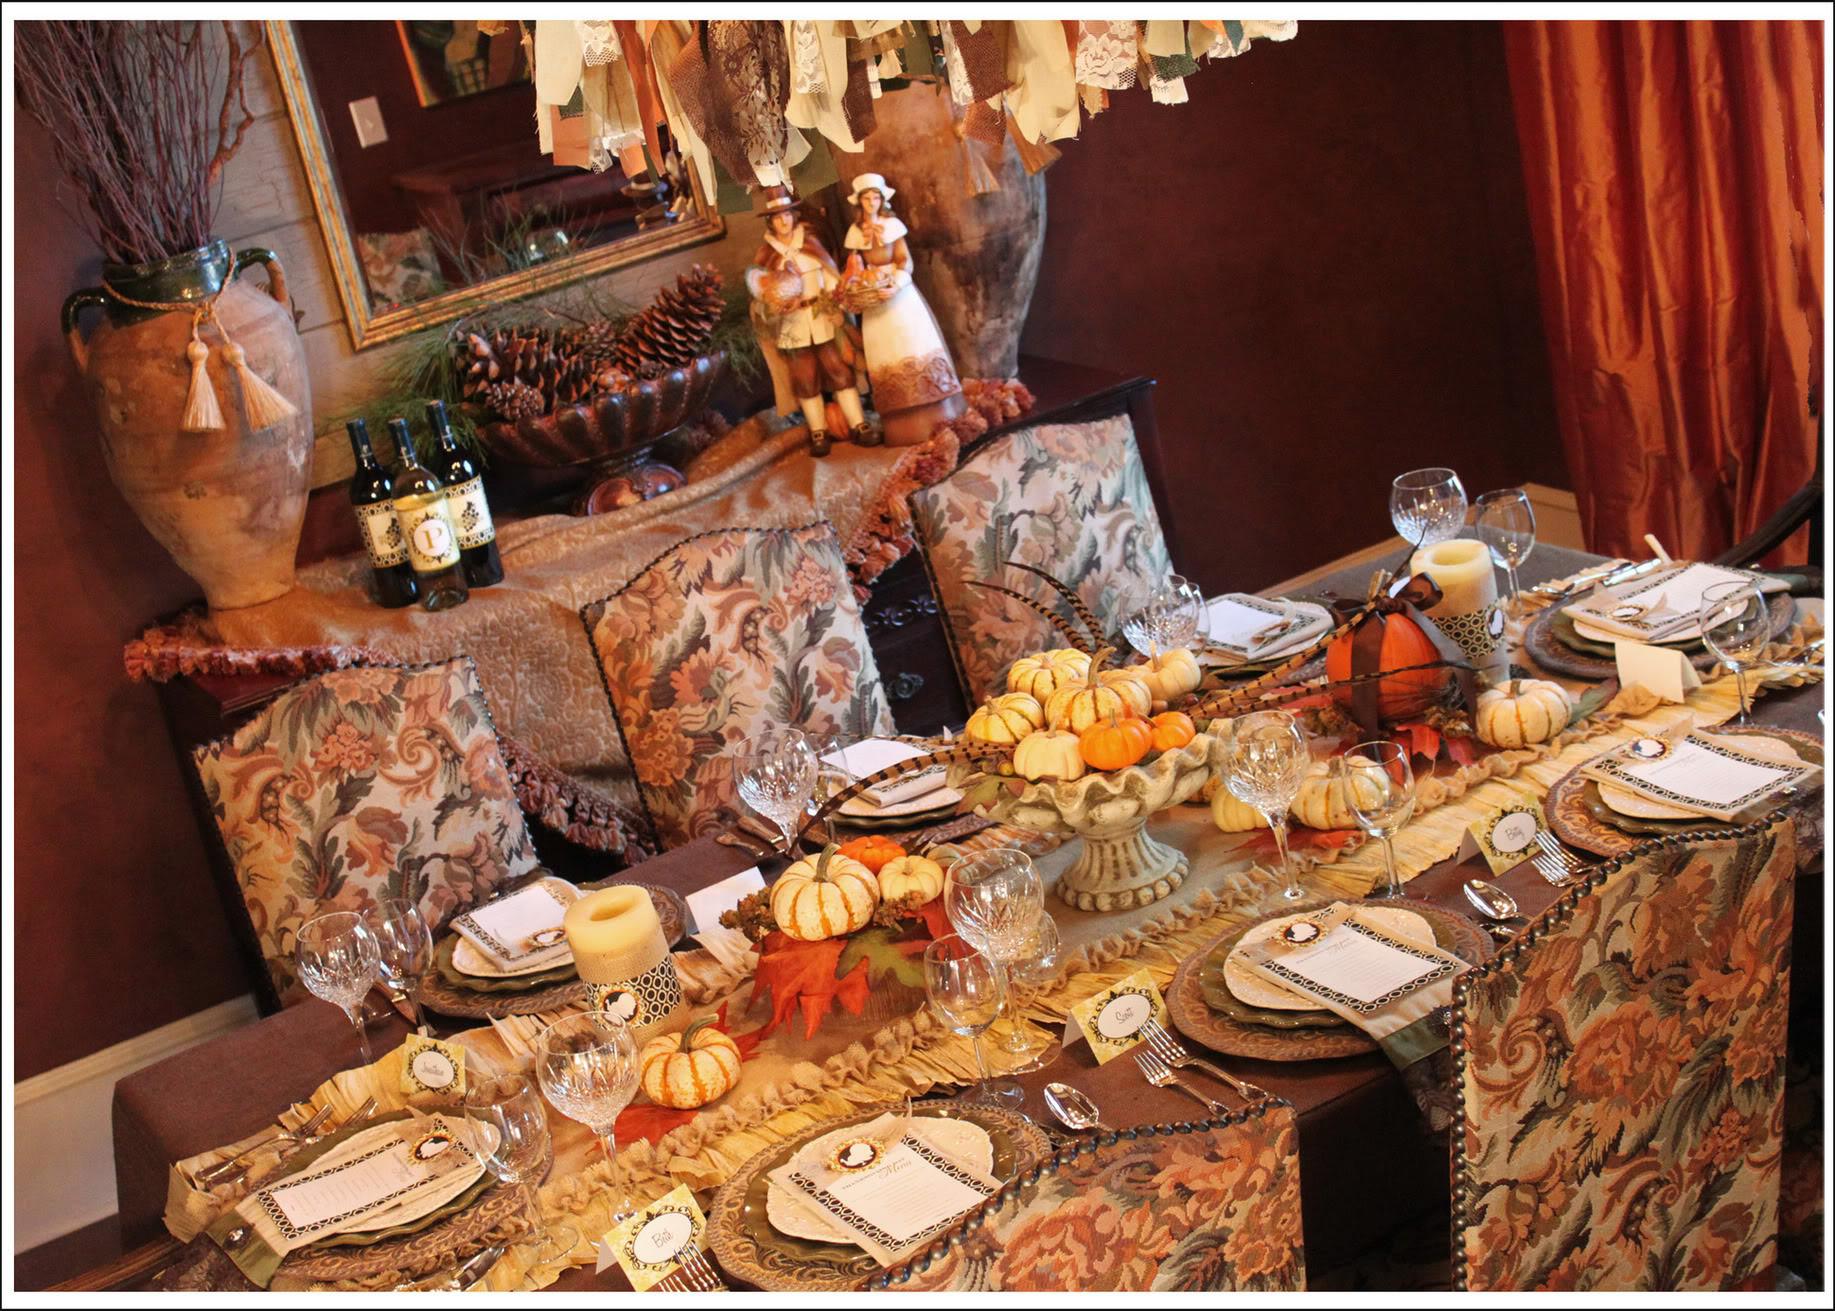 Thanksgiving Dinner Table  Thanksgiving Dinner Tablescapes